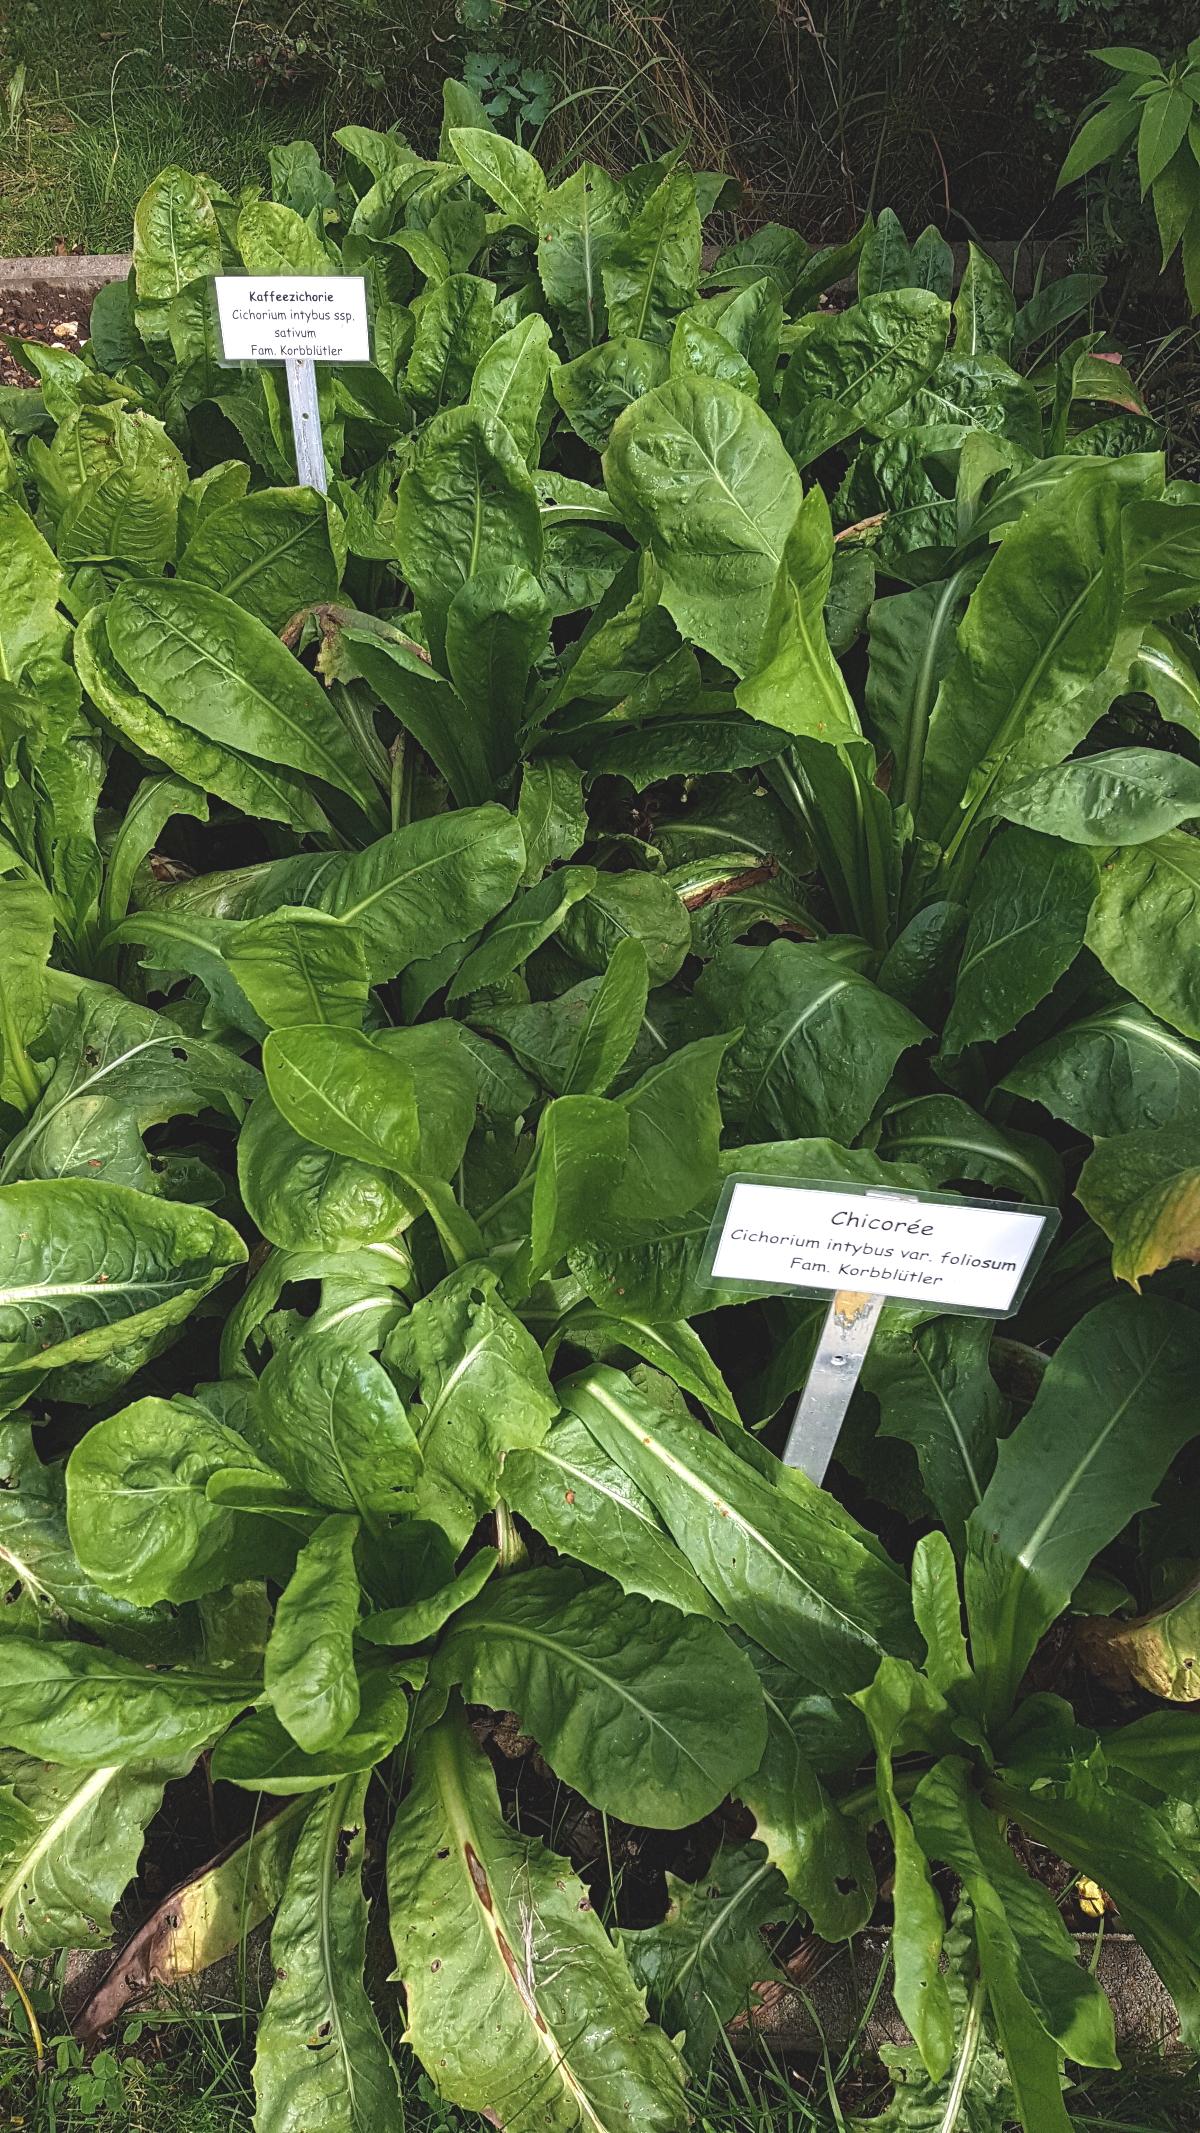 Cichorium intybus ssp. sativum - Kaffee-Zichorie